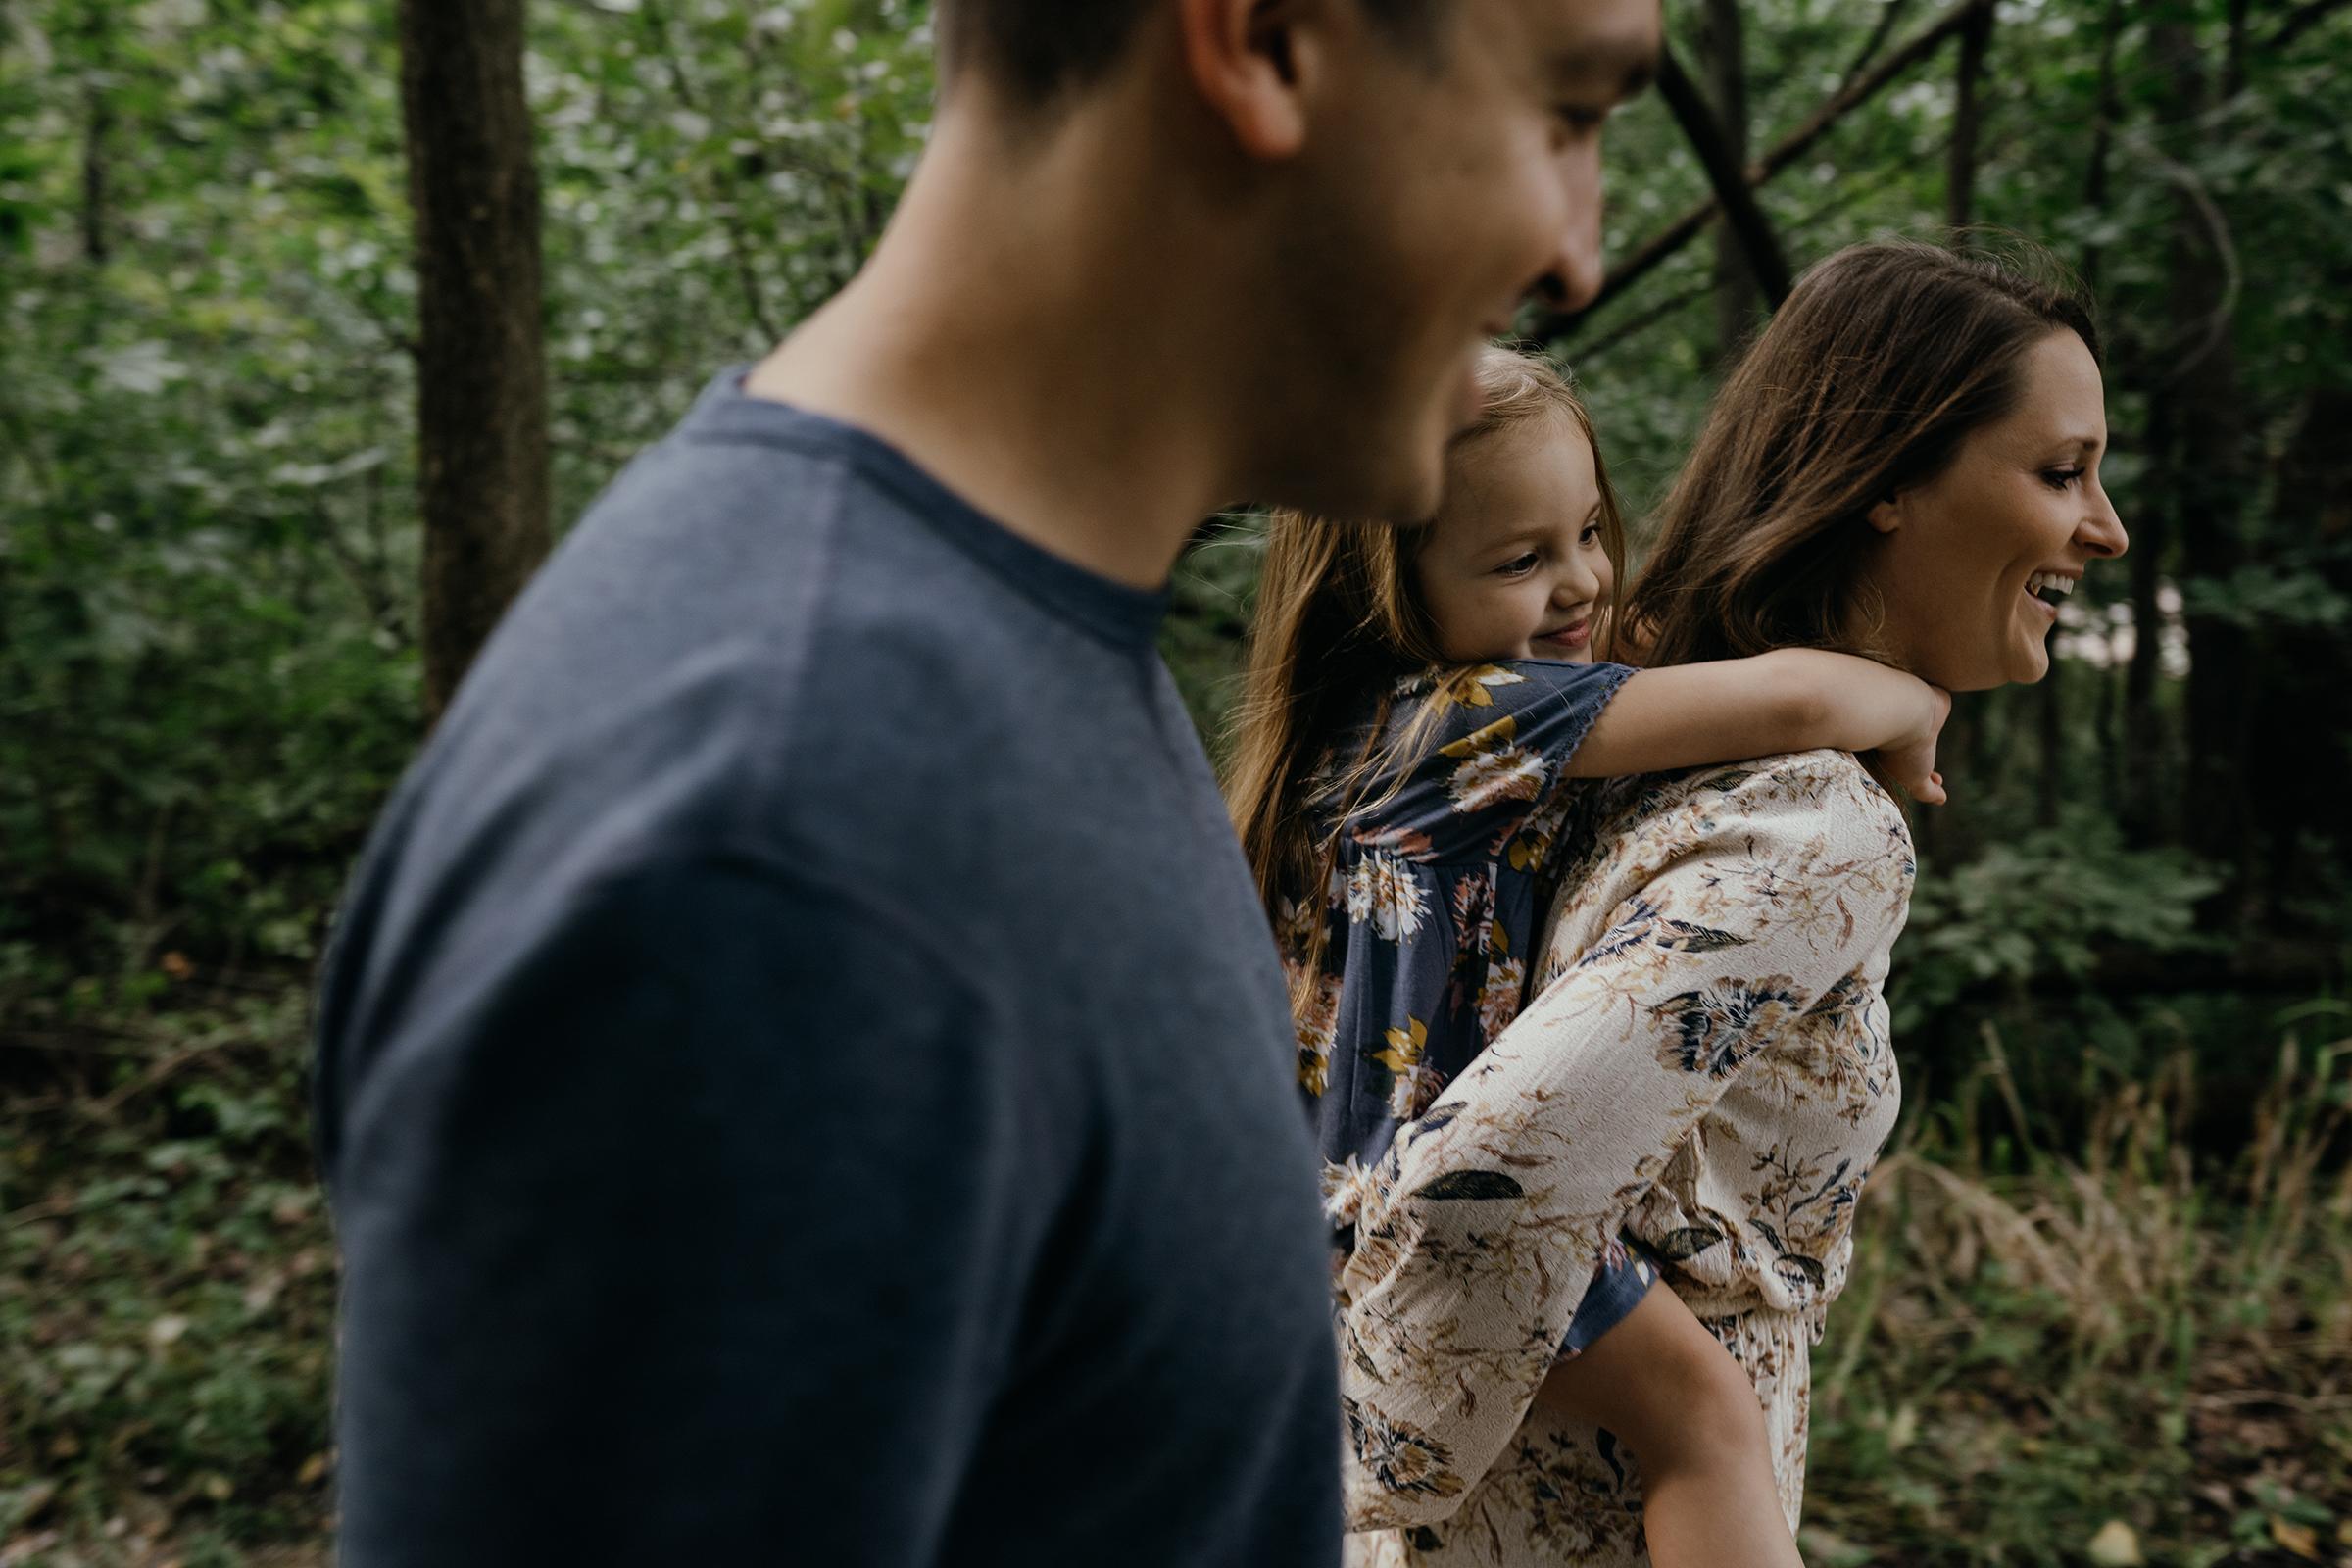 mueller-family-walking-with-child-on-back-of-mom-granger-iowa-raelyn-ramey-photography.jpg